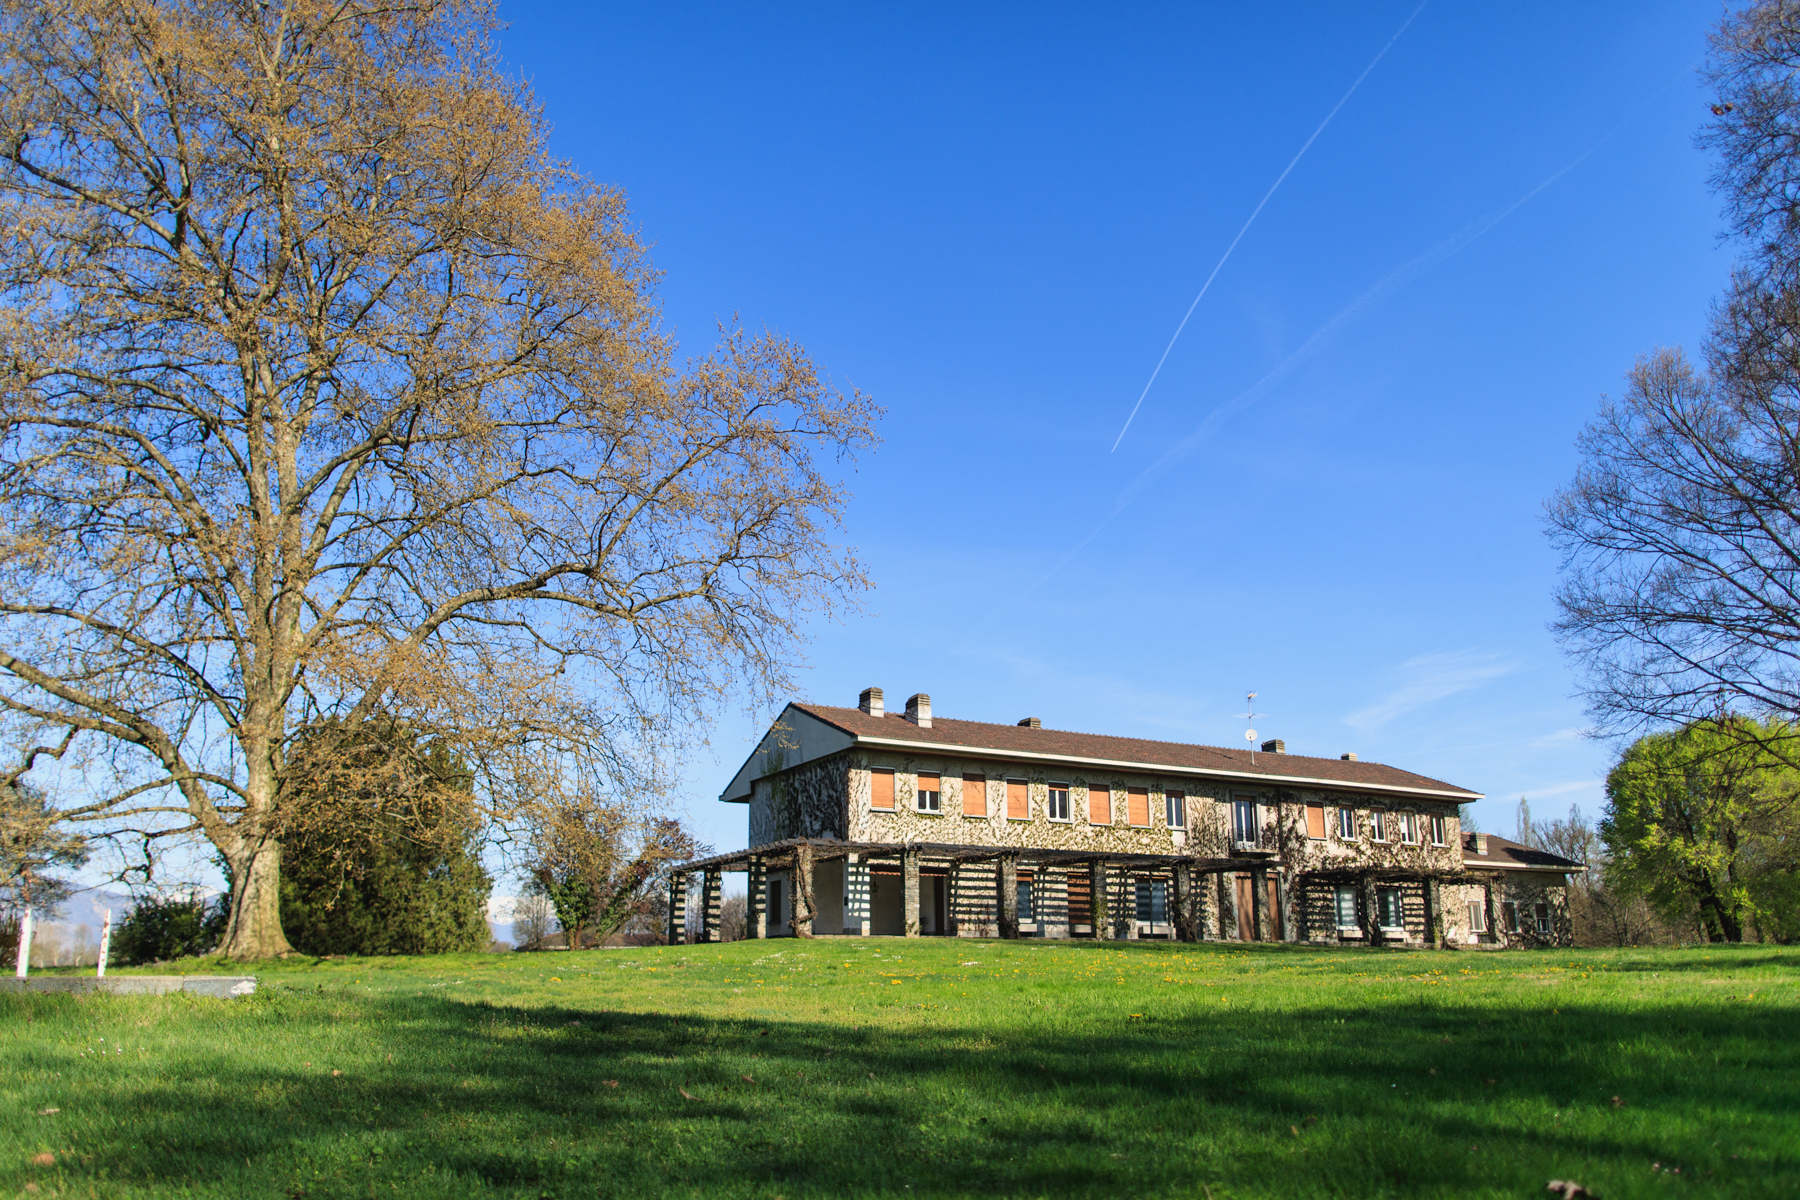 Single Family Home for Sale at Stately villa in La Mandria Park Via Giuseppe Cavallo Venaria Reale, Turin, 10078 Italy